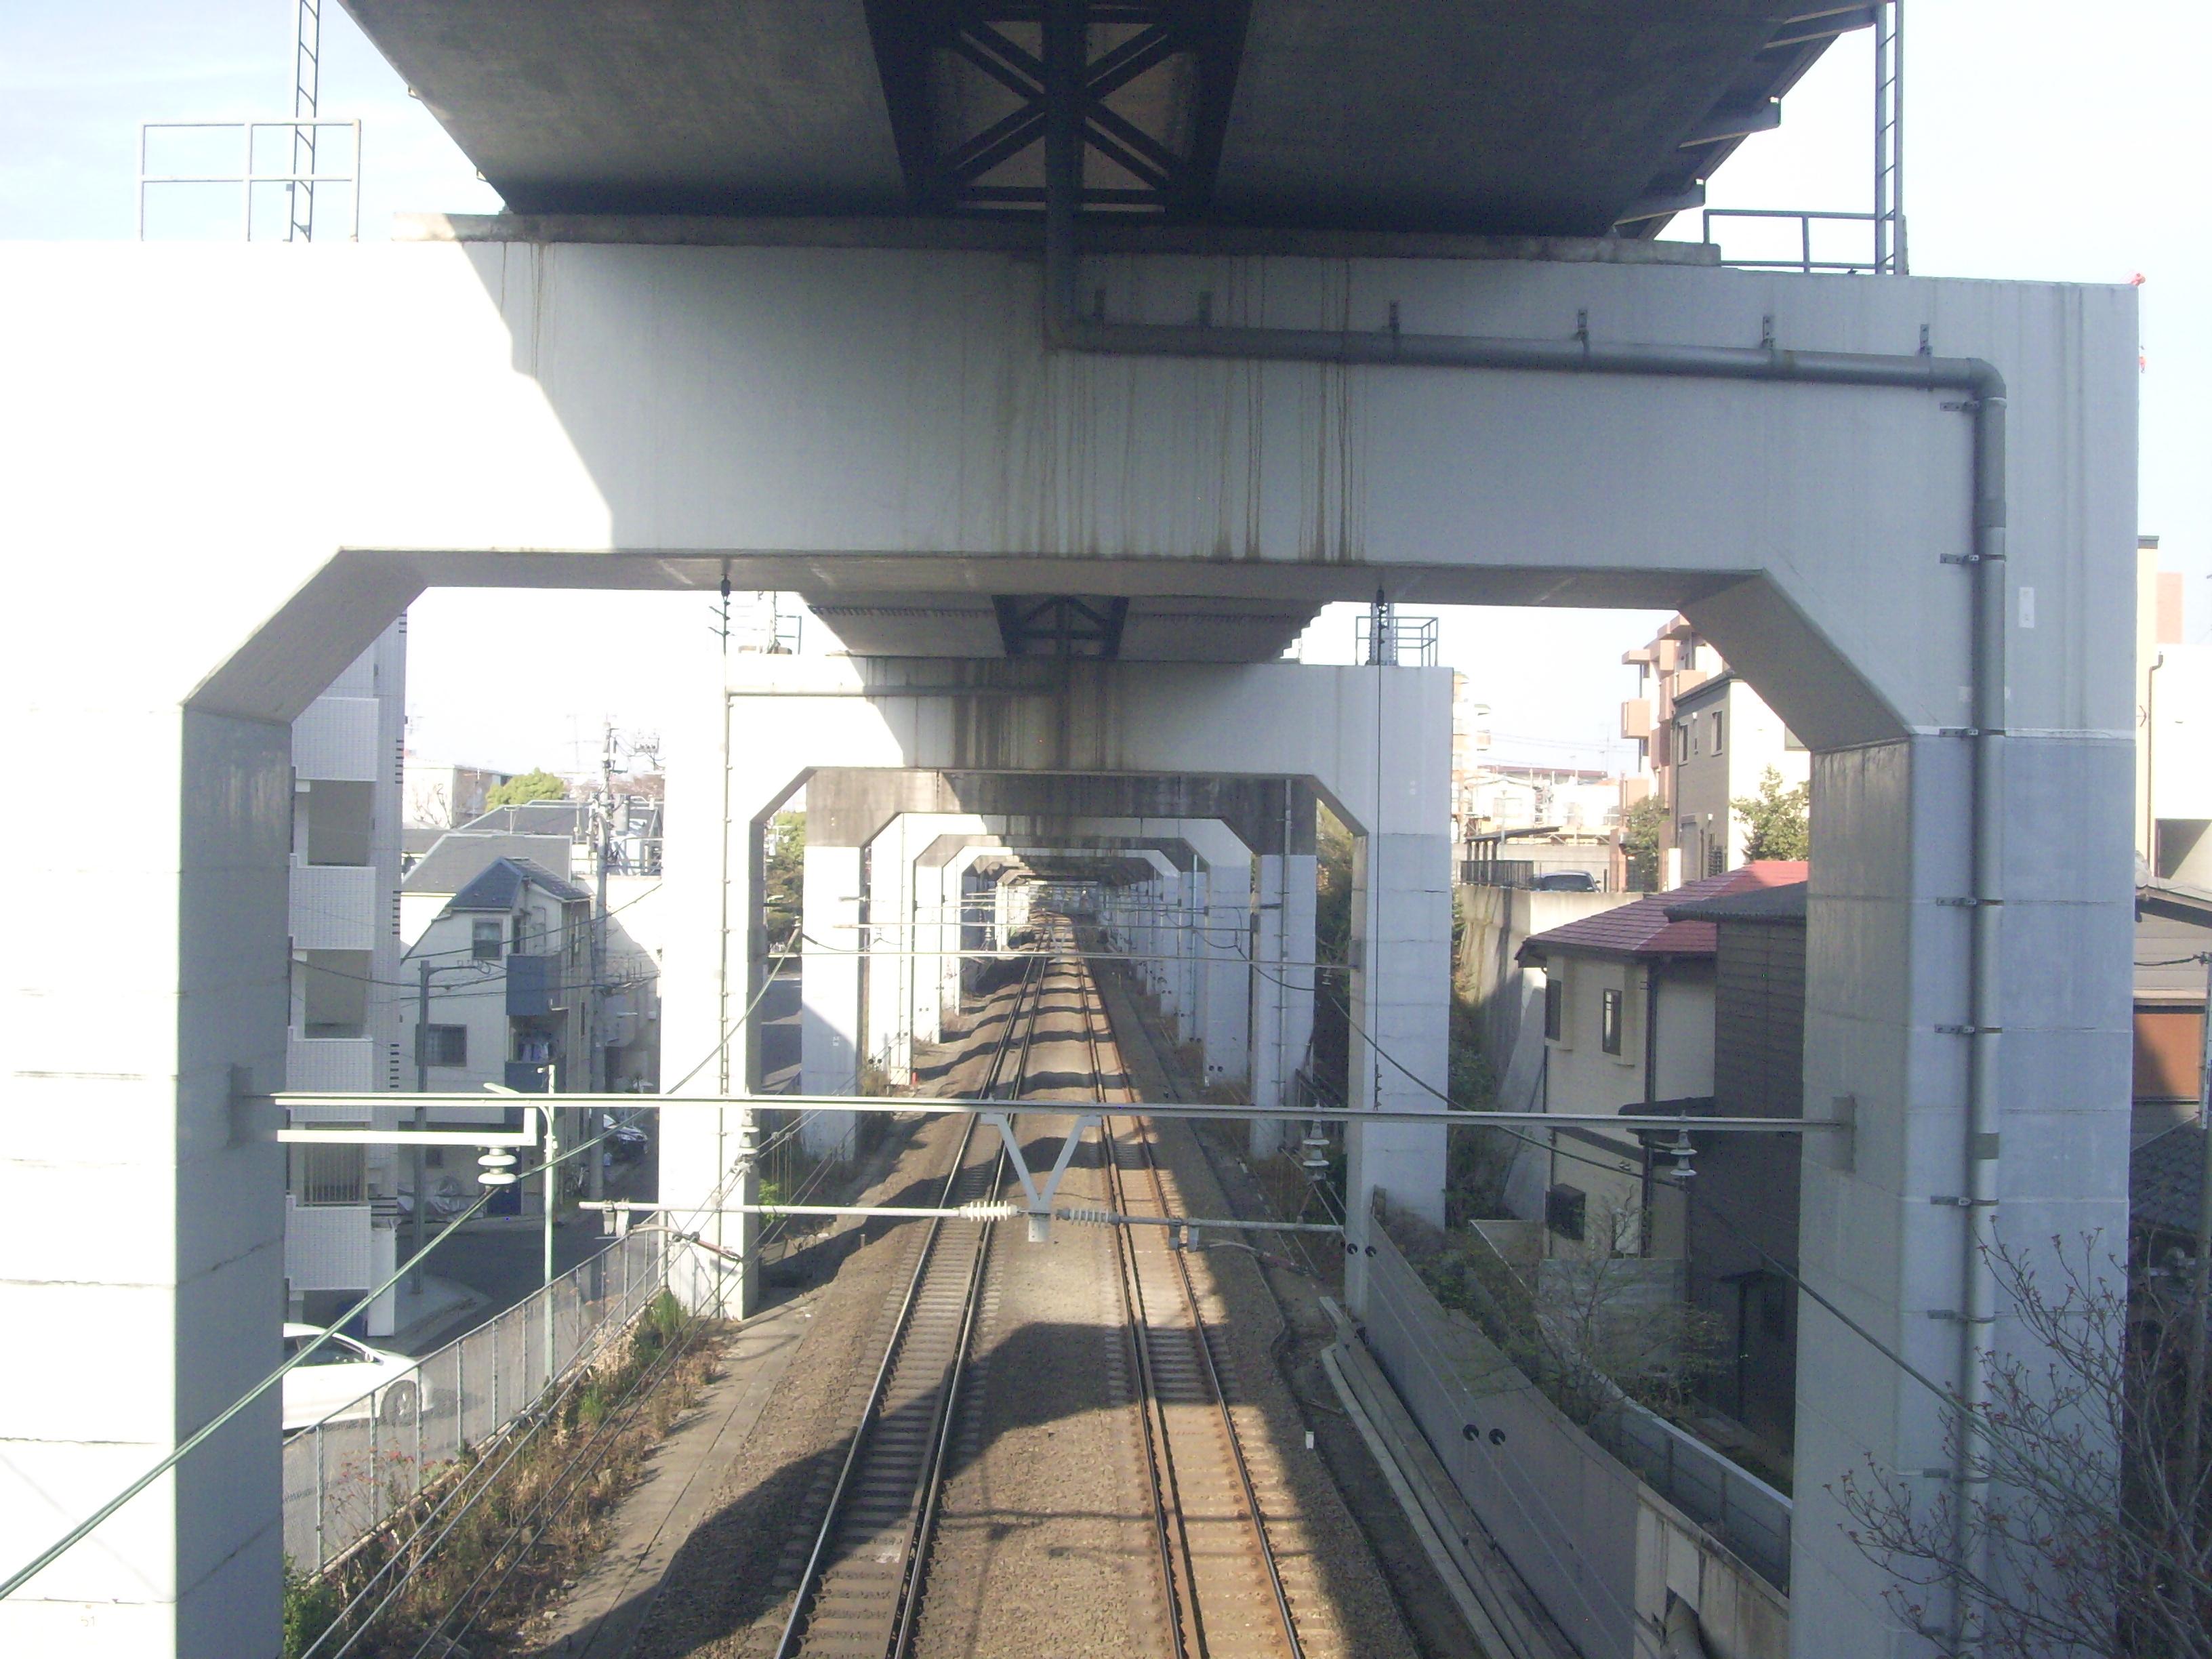 https://upload.wikimedia.org/wikipedia/commons/7/7b/Above_Bl_-_Hinkaku_line_%26_Tokaido_Shinkansen_1.jpg